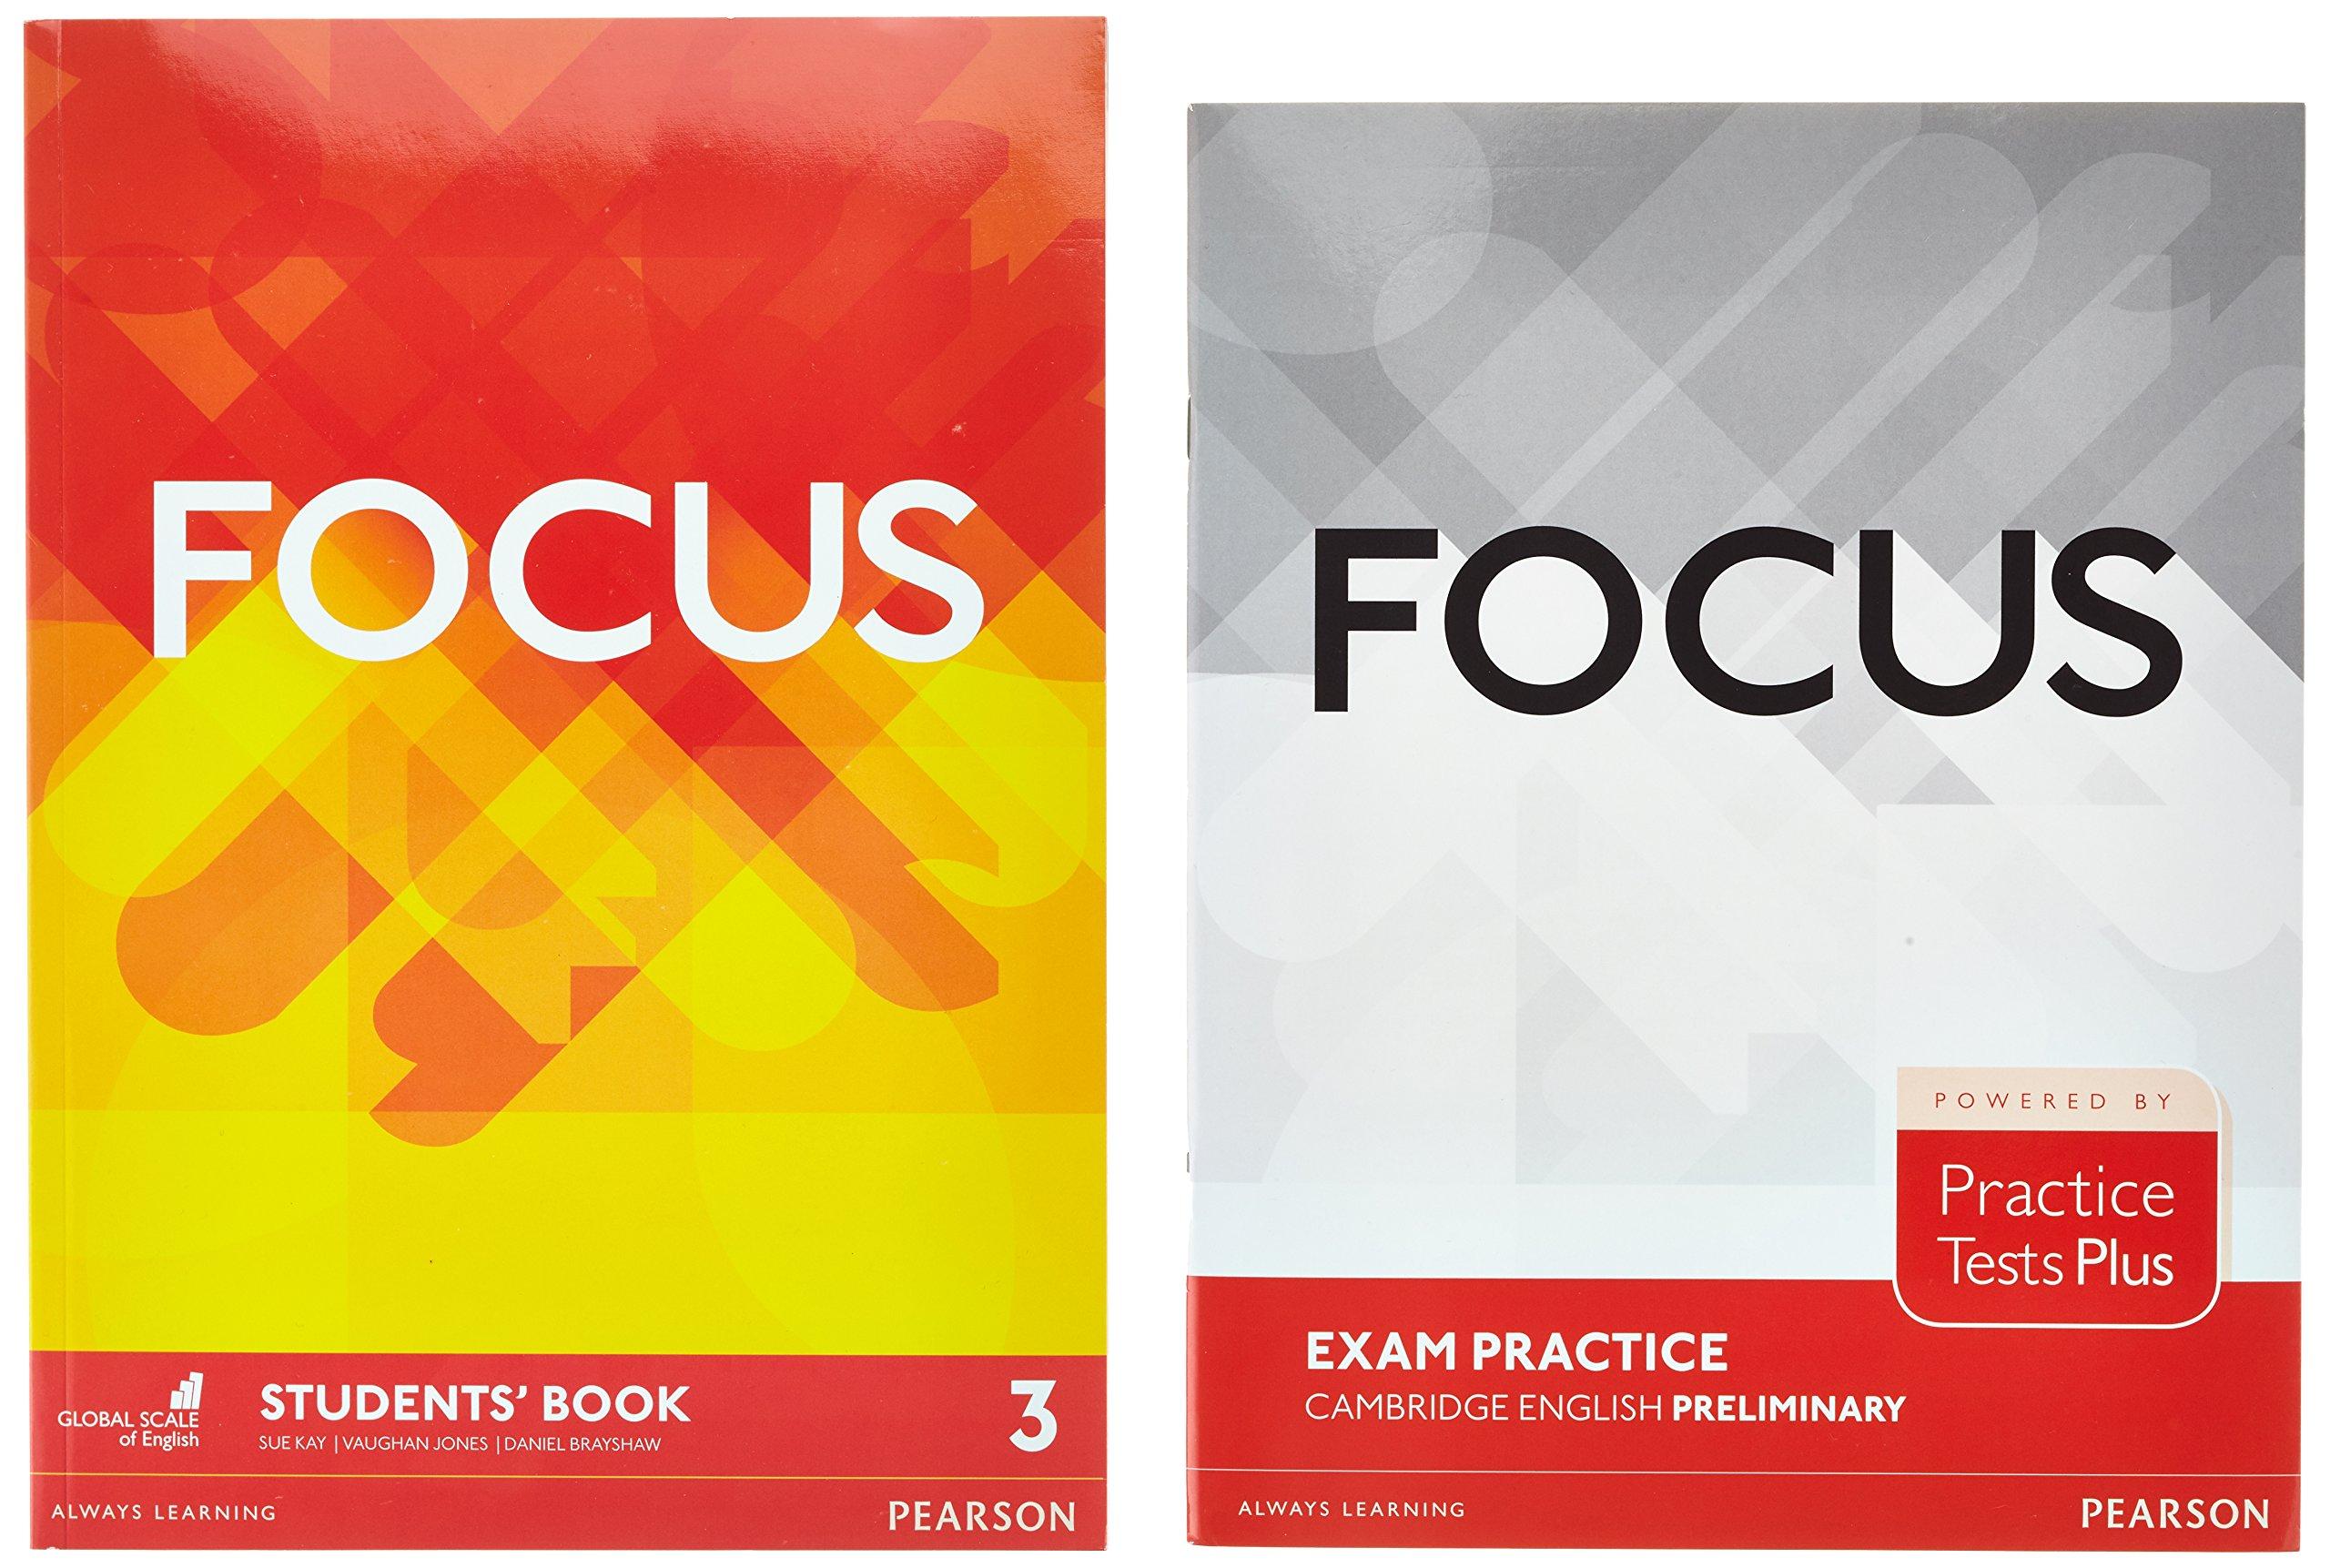 Focus BrE 3 Students Book & Practice Tests Plus Preliminary Booklet Pack: Amazon.es: Jones, Vaughan, Kay, Sue, Brayshaw, Daniel, Whitehead, Russell: Libros en idiomas extranjeros